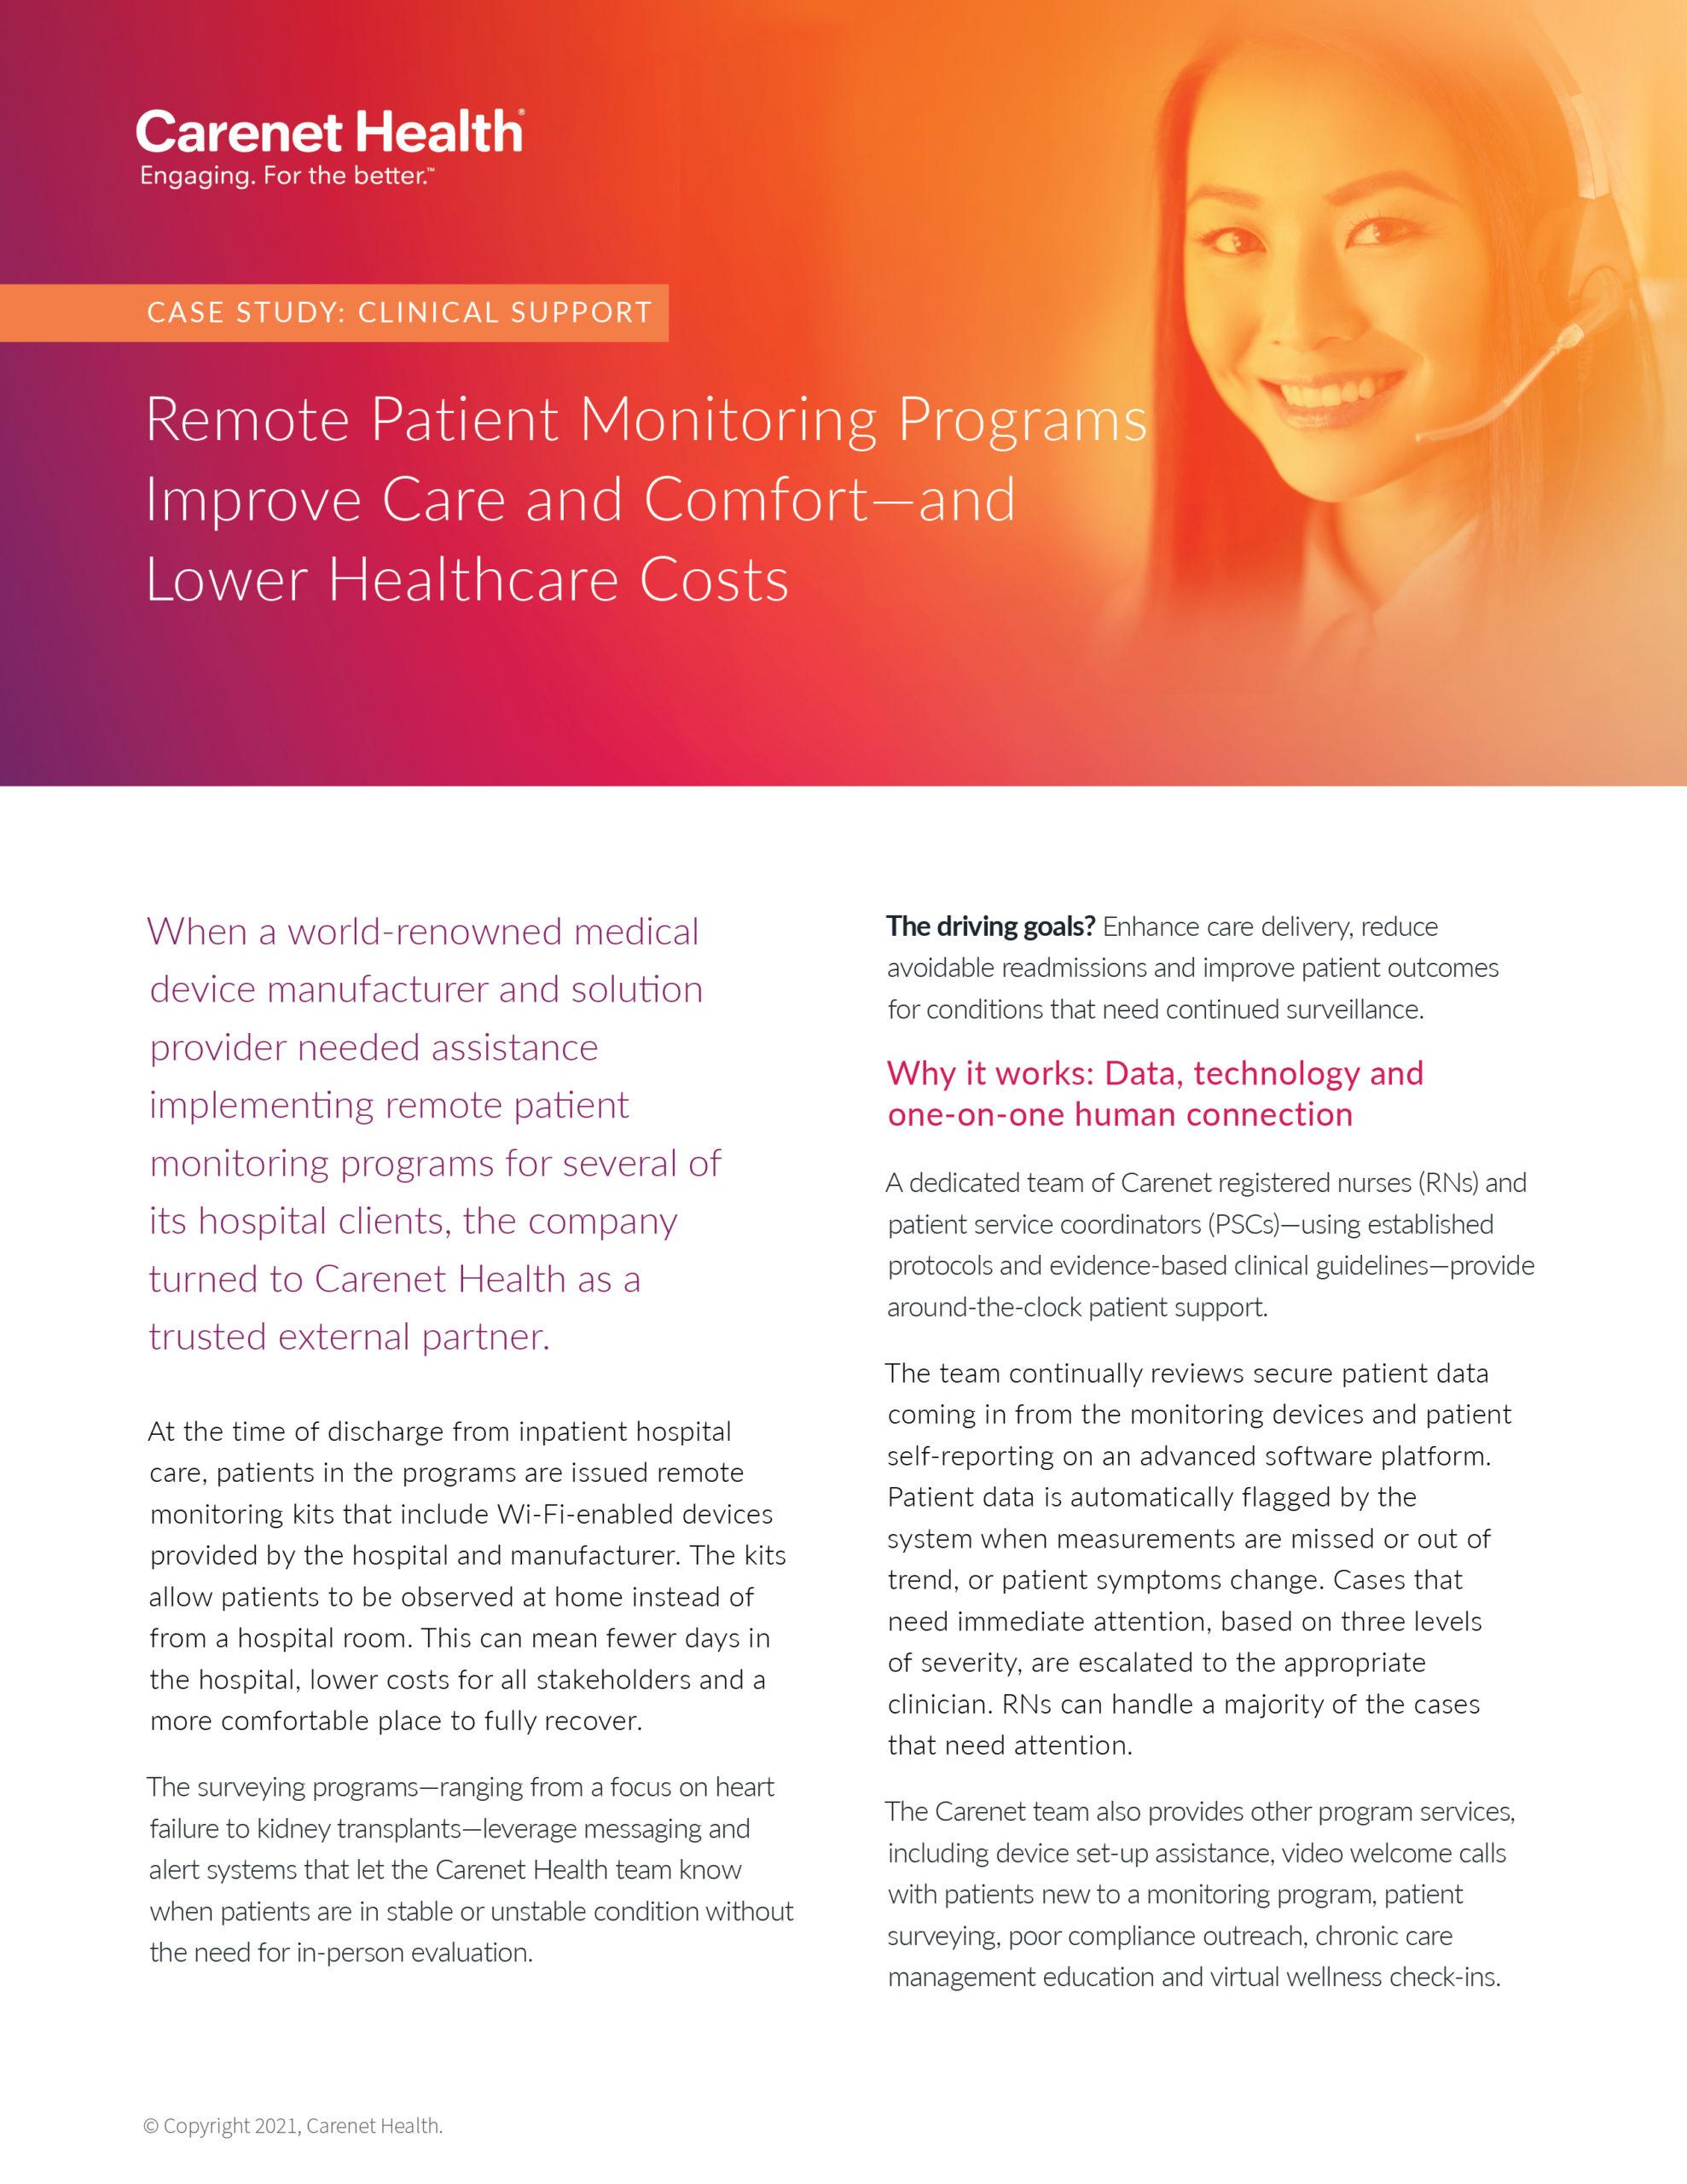 Health Plan Engagement RFP Checklist Sample